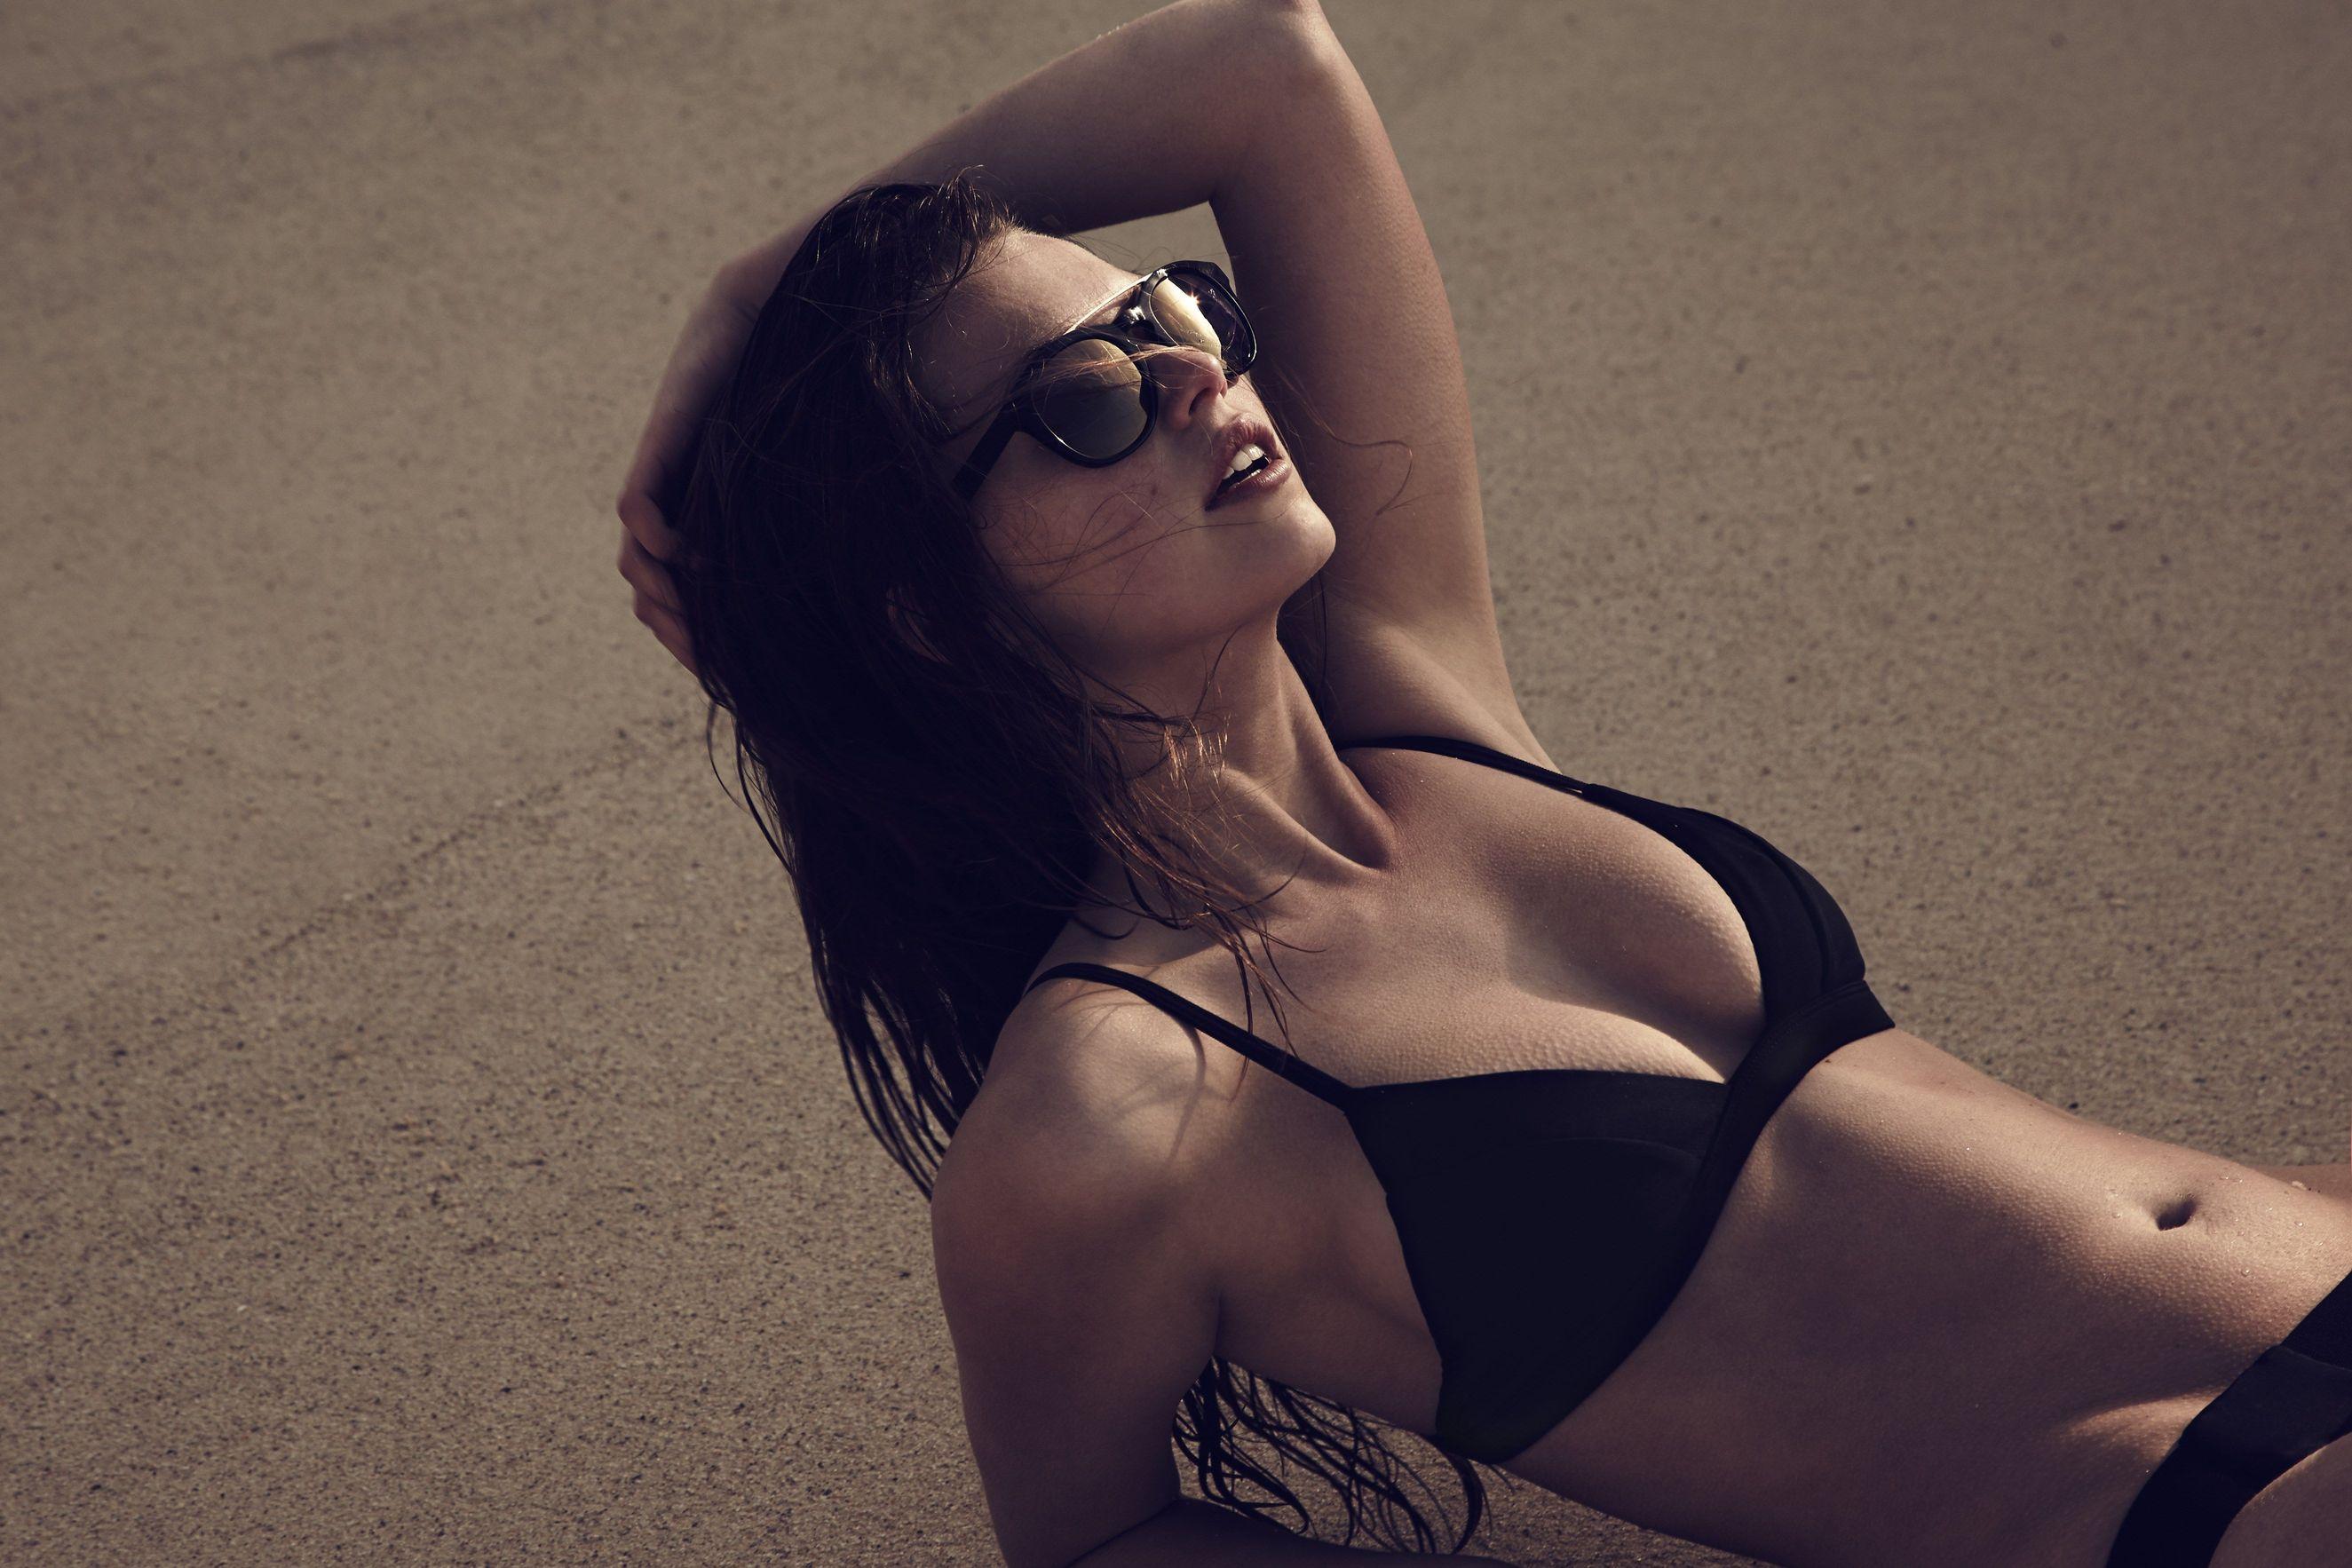 Porno Gigi Midgley nude (11 foto and video), Sexy, Hot, Selfie, panties 2015